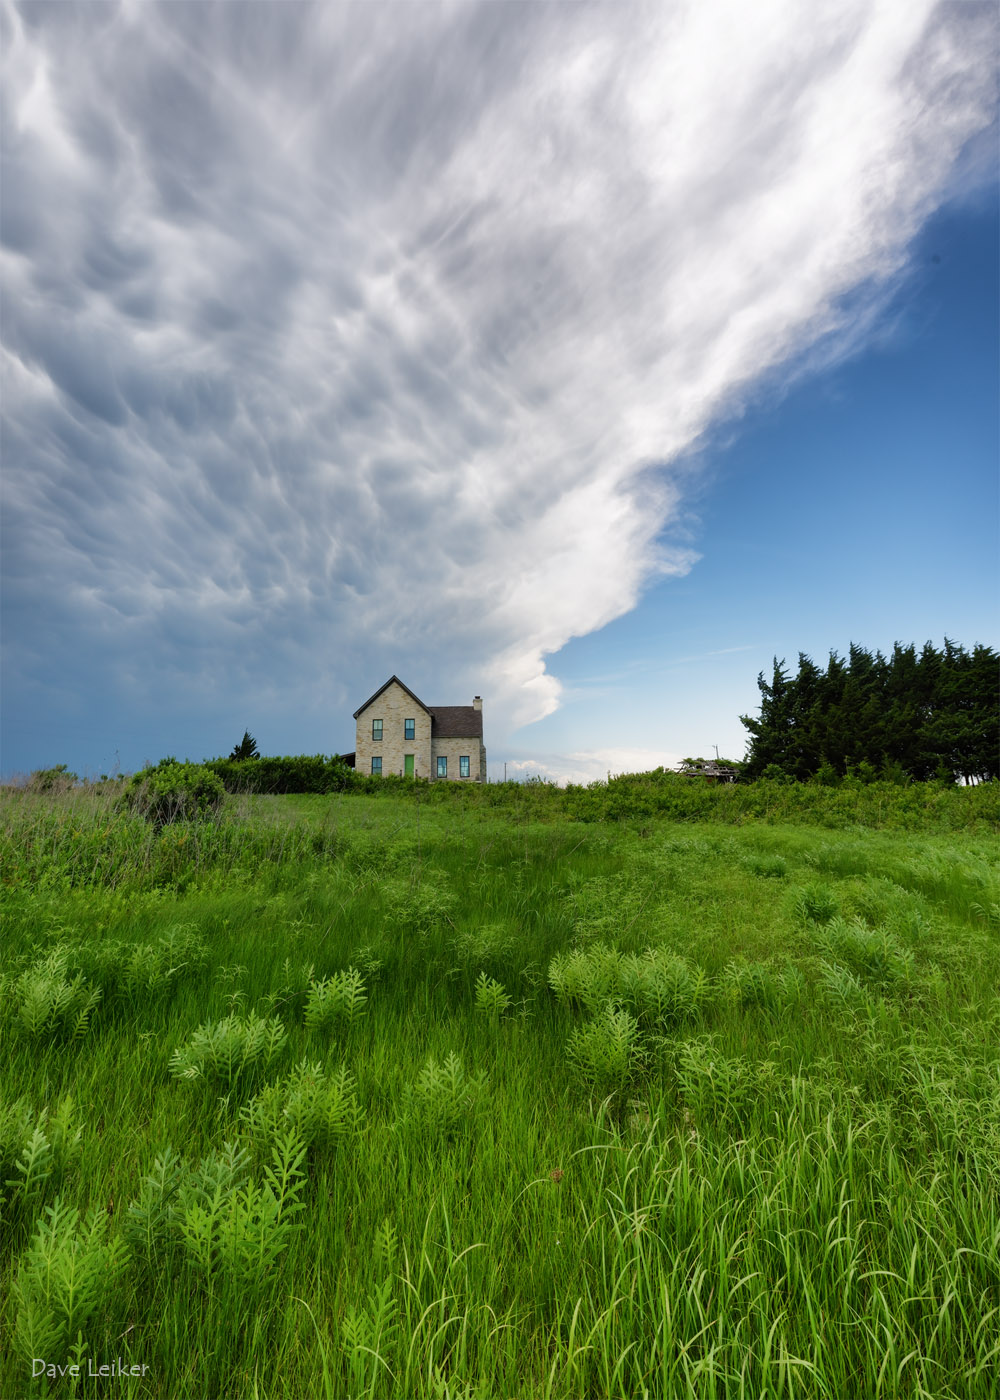 Stone House, Greenwood County